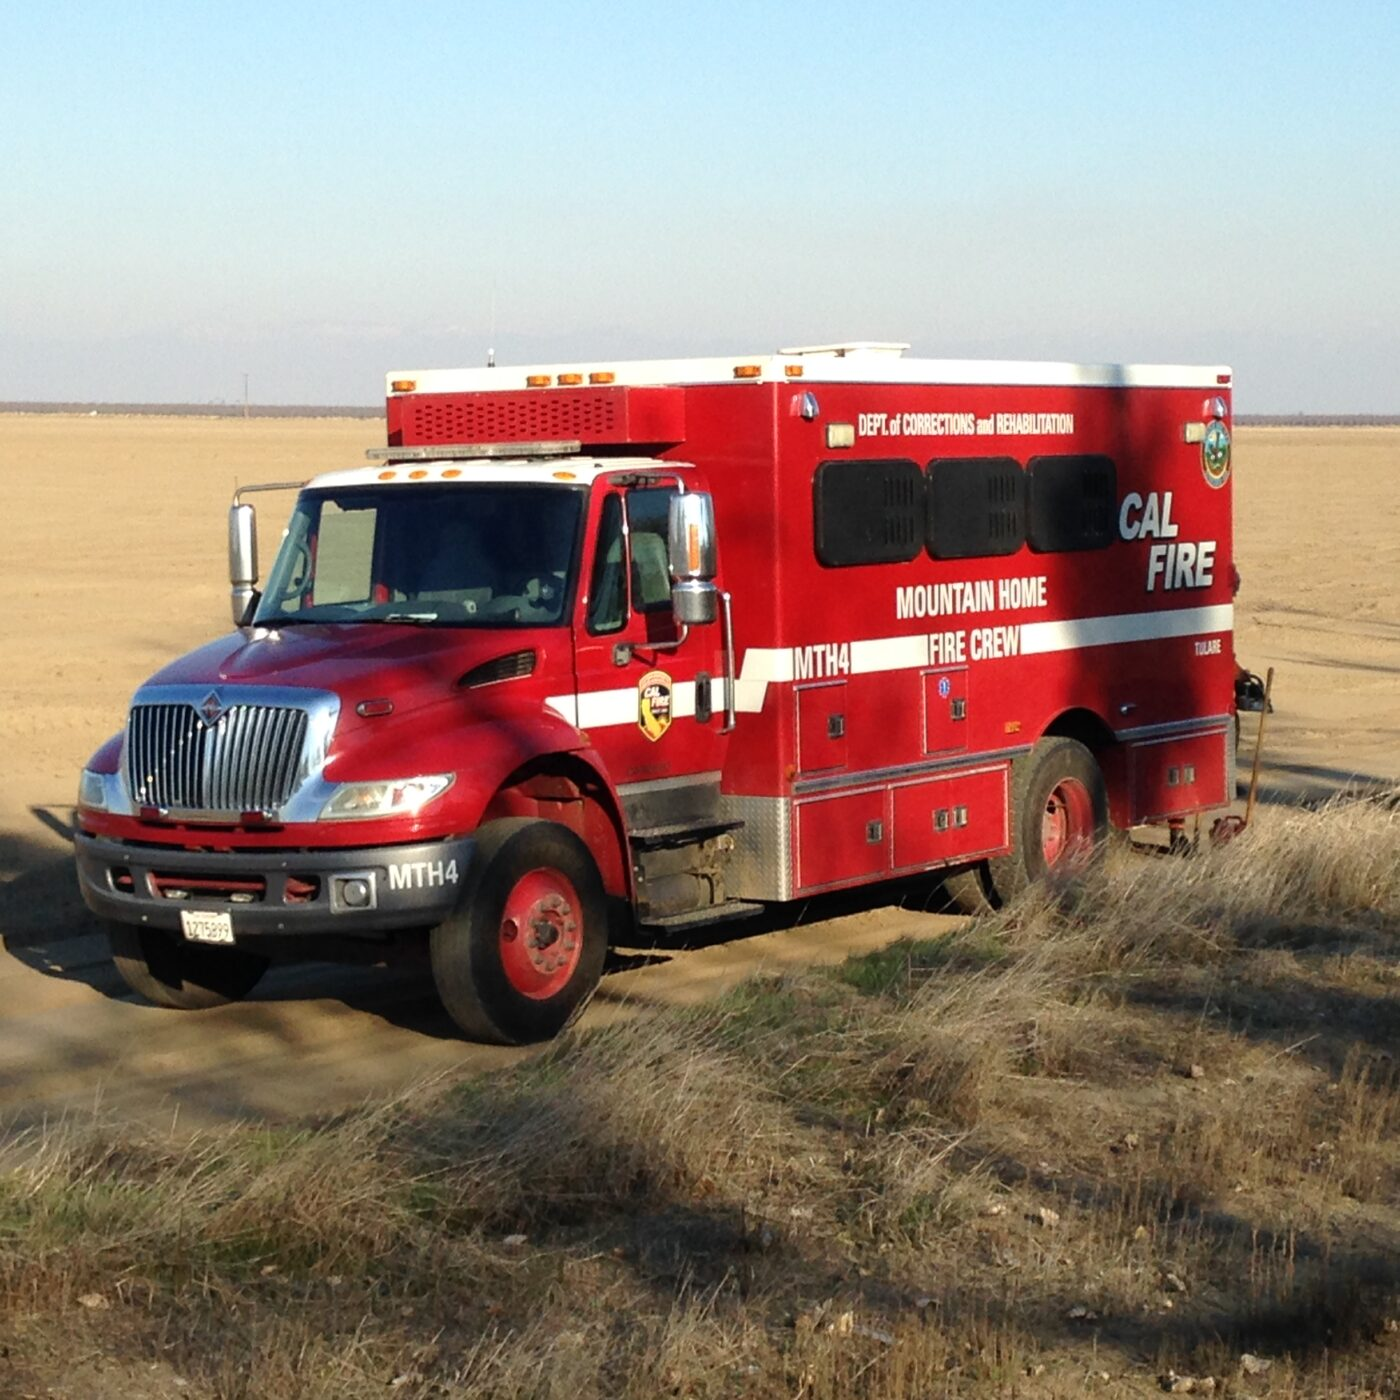 CalFire bus